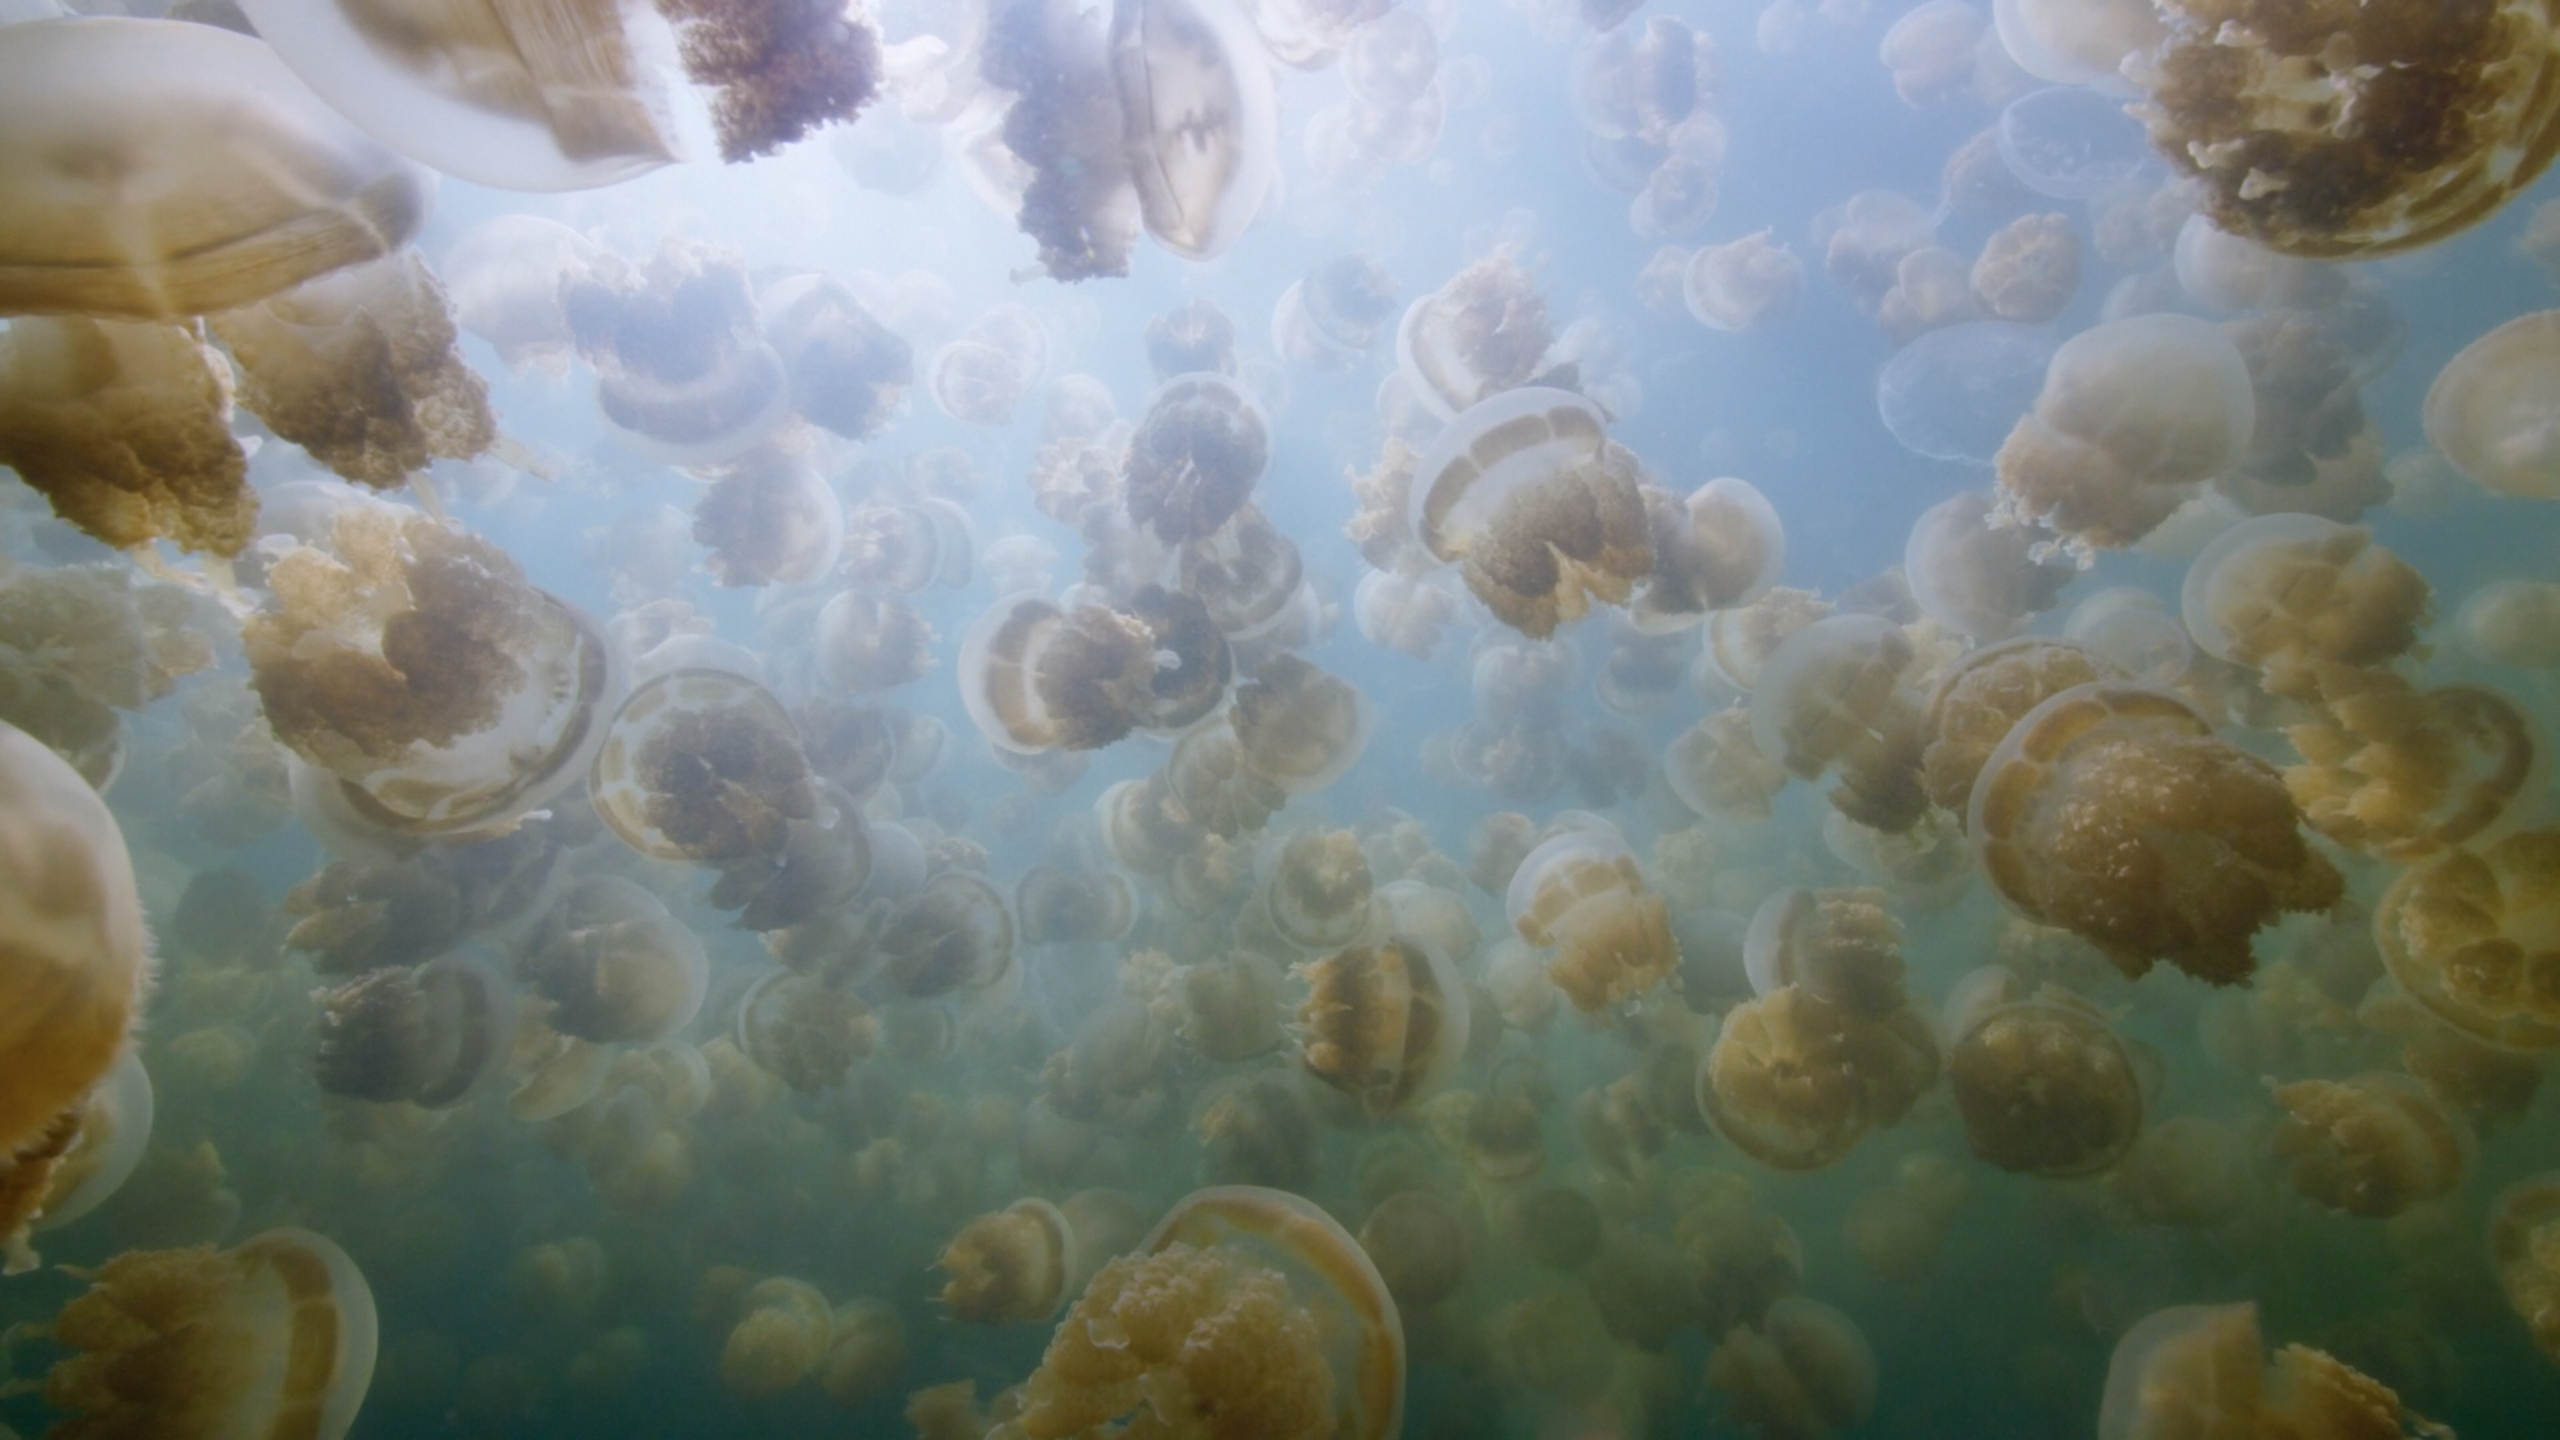 Apple Tv Now Features 10 Beautiful Underwater Video Screensavers 9to5mac